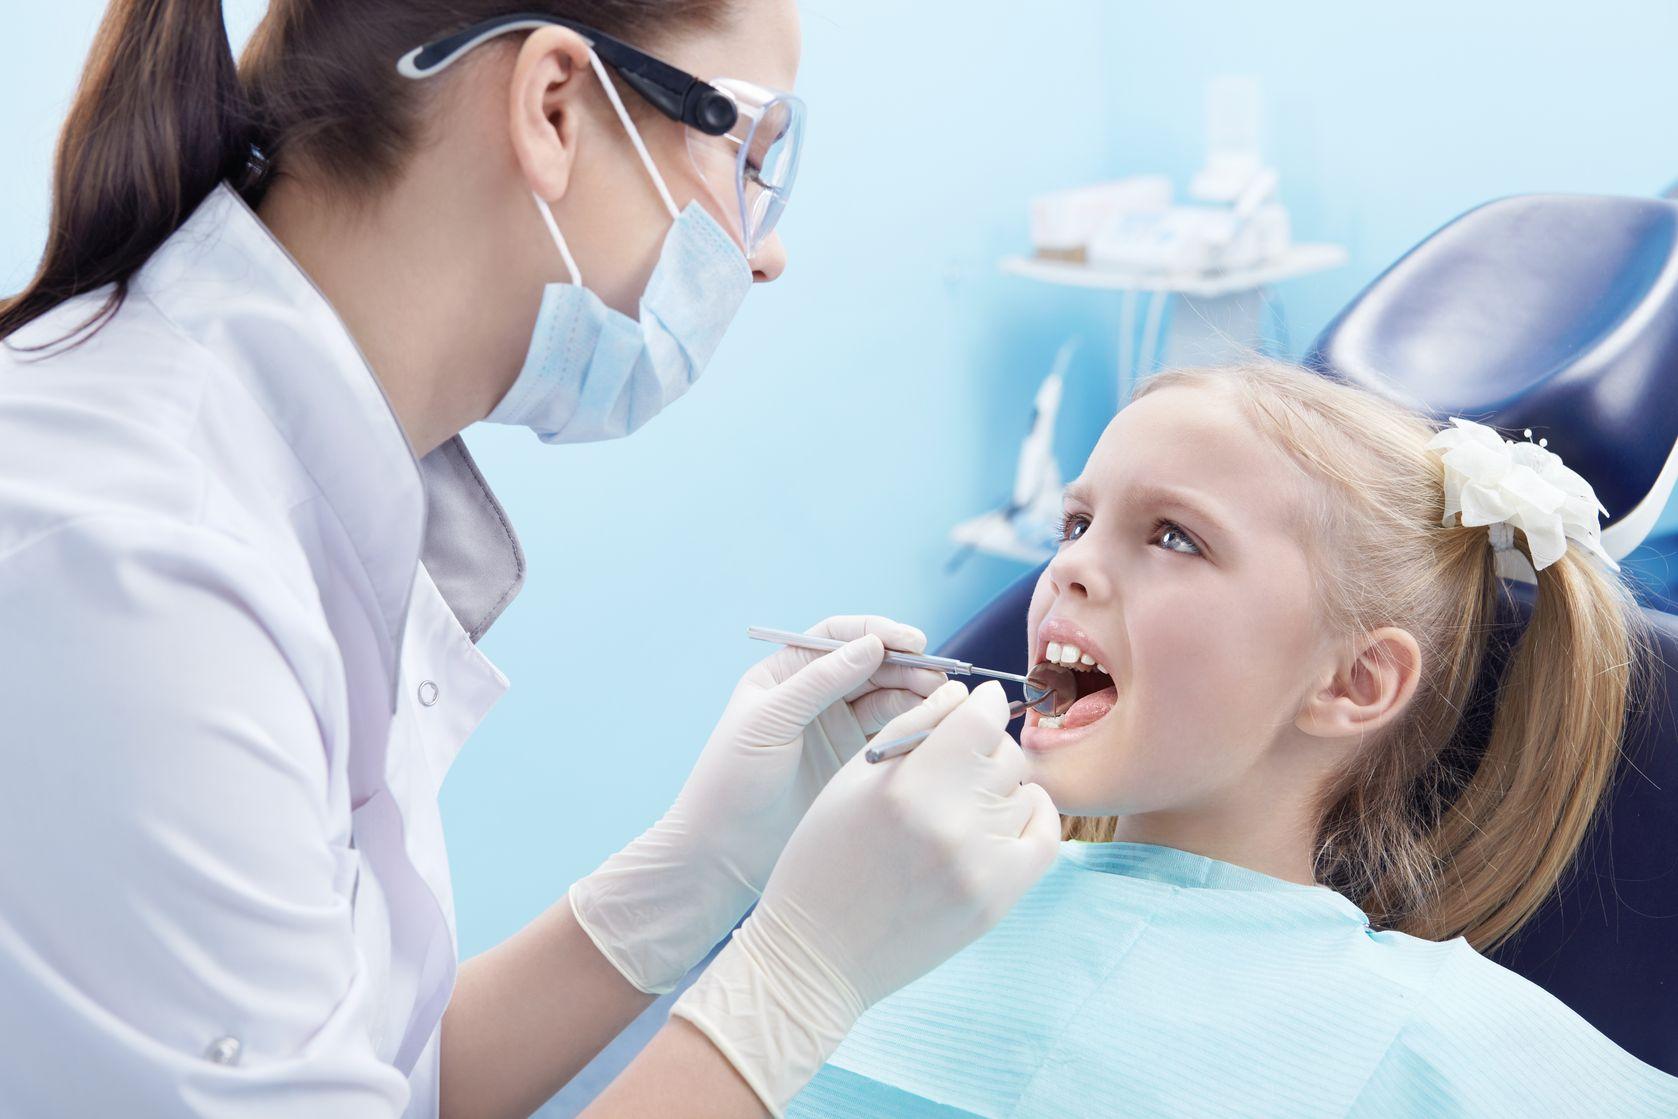 impianti dentali nei bambini